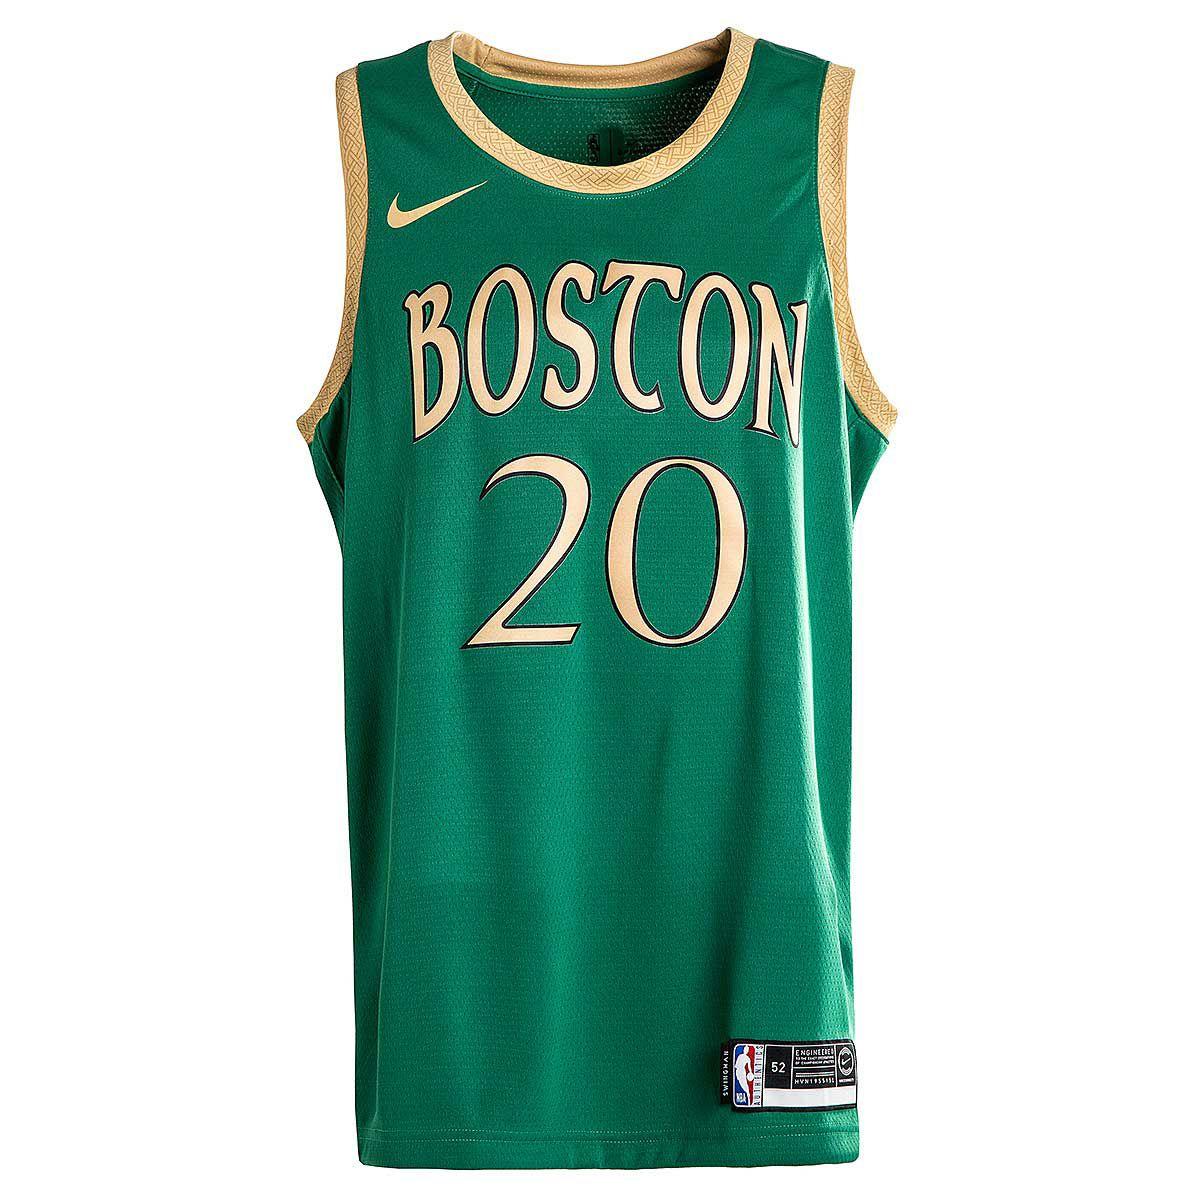 Maillot Nike NBA Swingman Hayward Boston Celtics 19 - Tailles 40 à 56